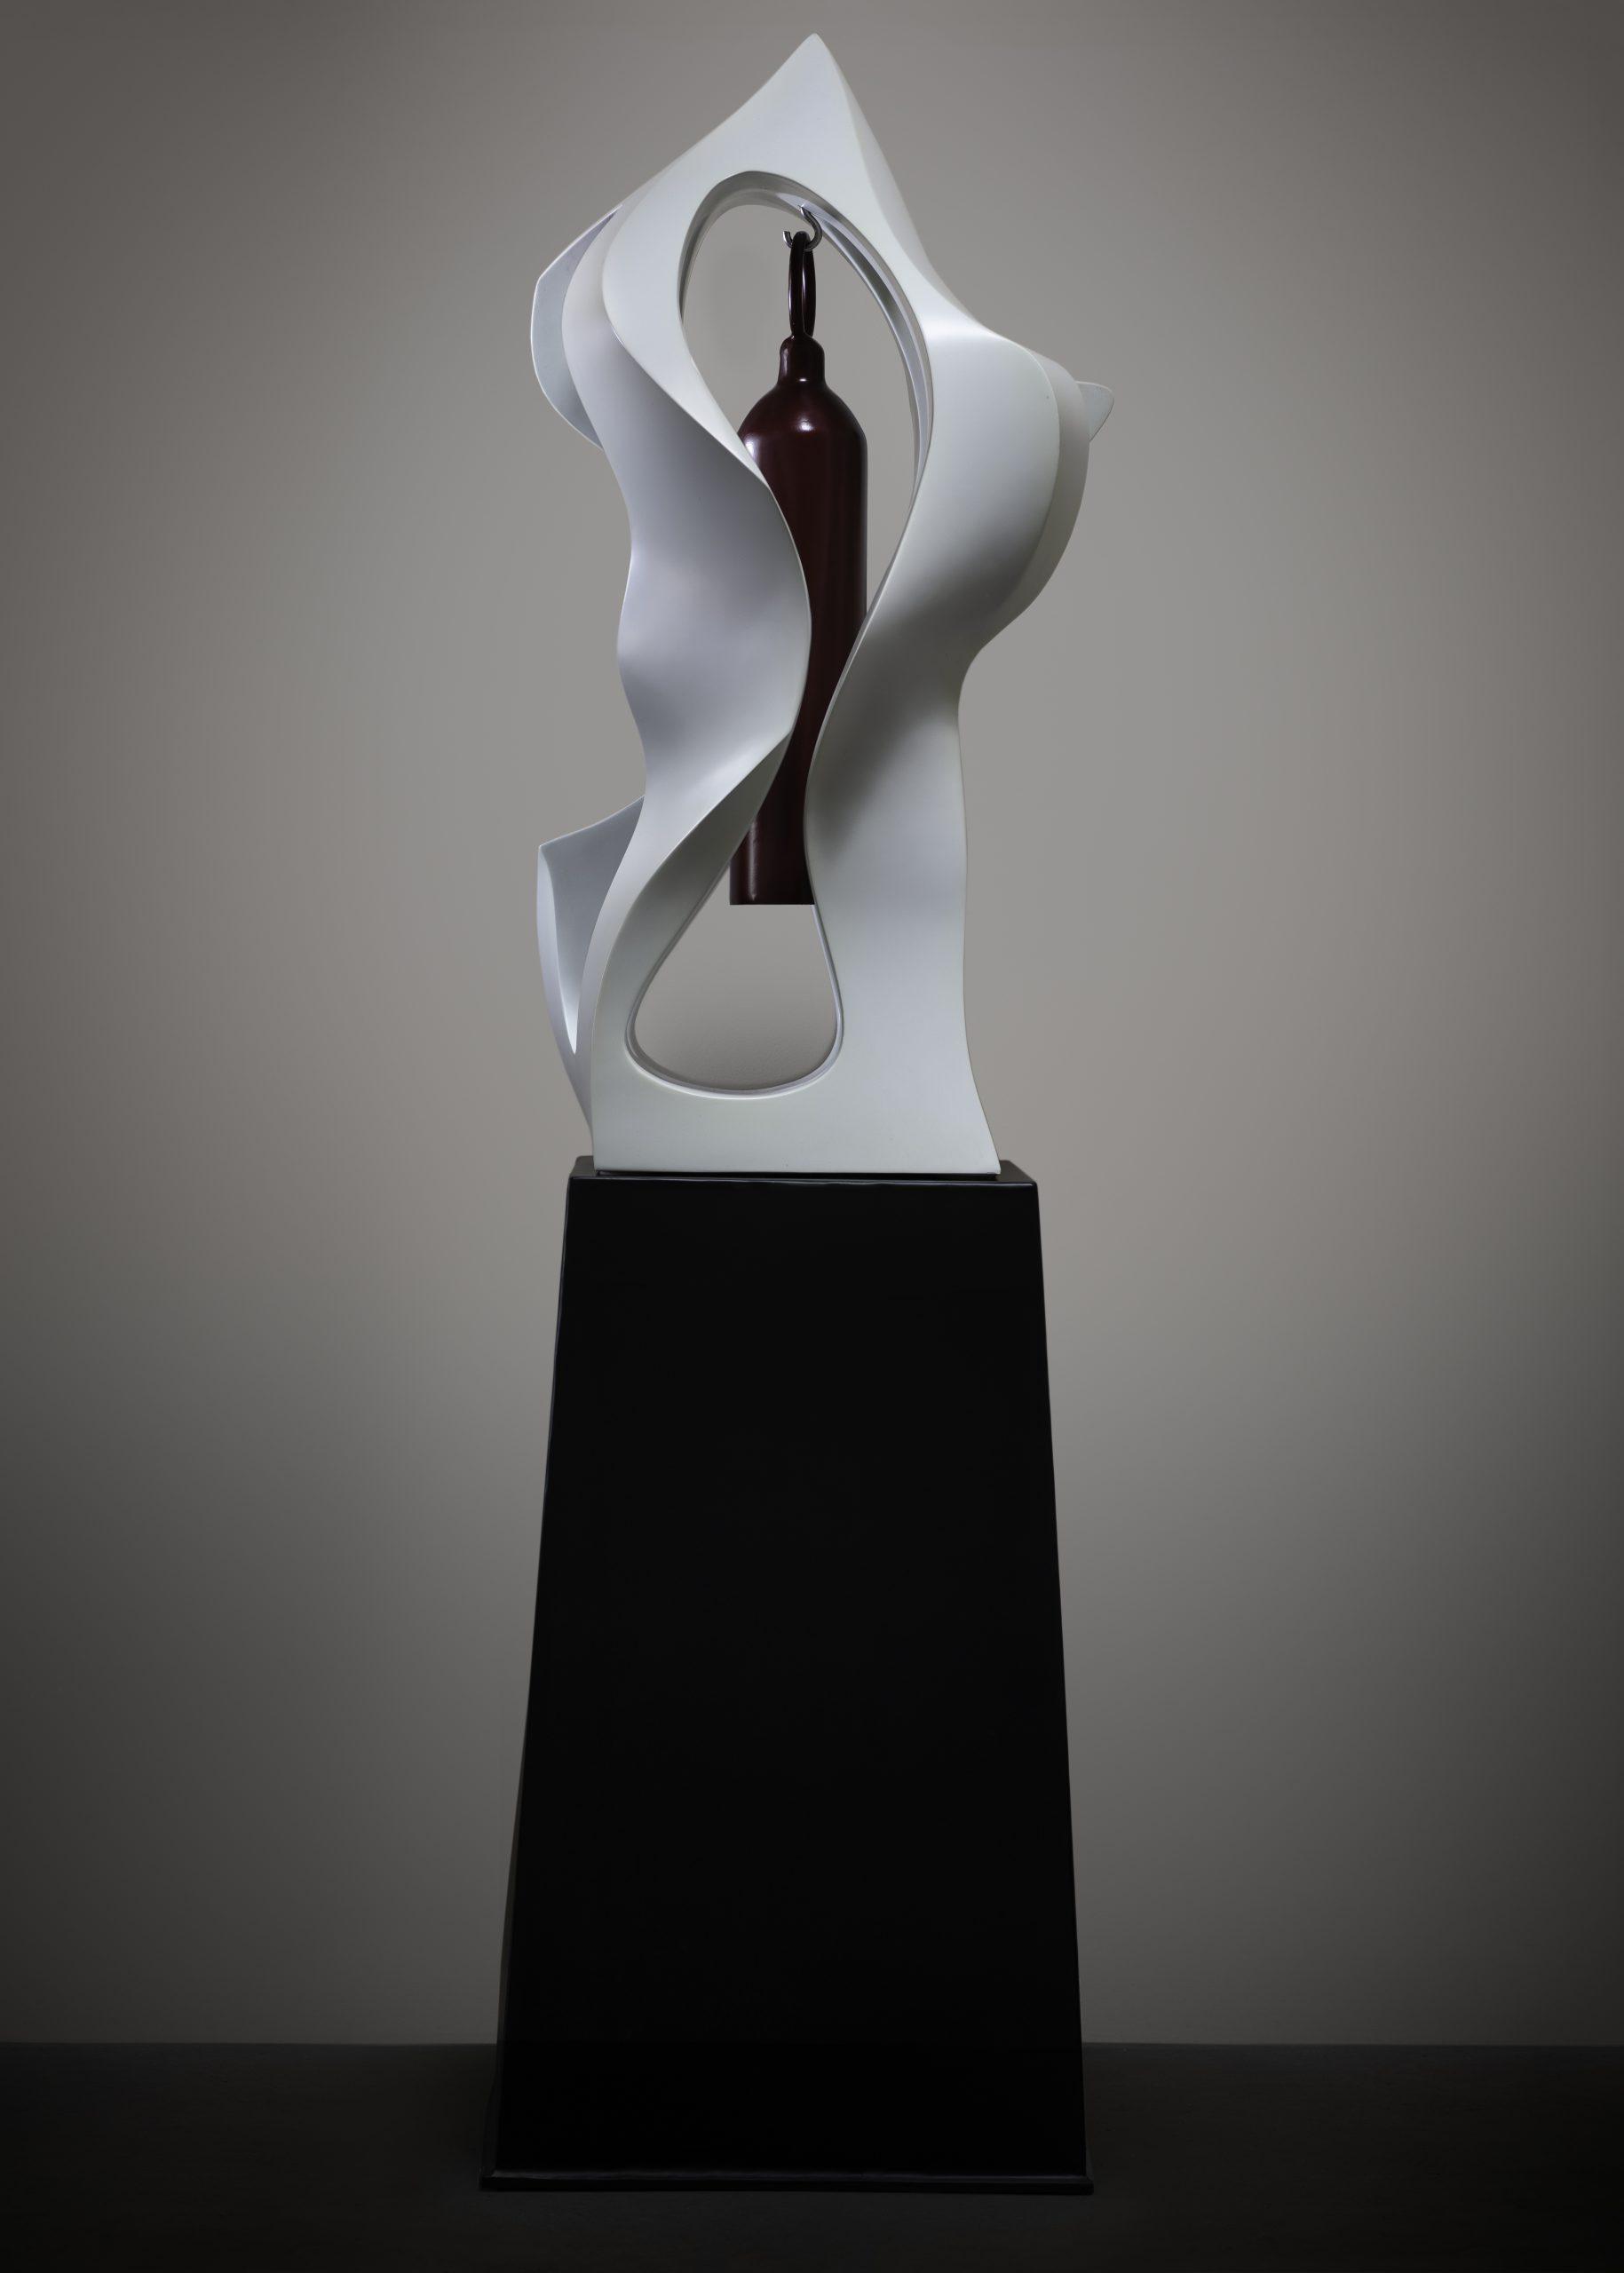 SoundWaves, a 3D printed & metal sound sculpture - Kevin Caron